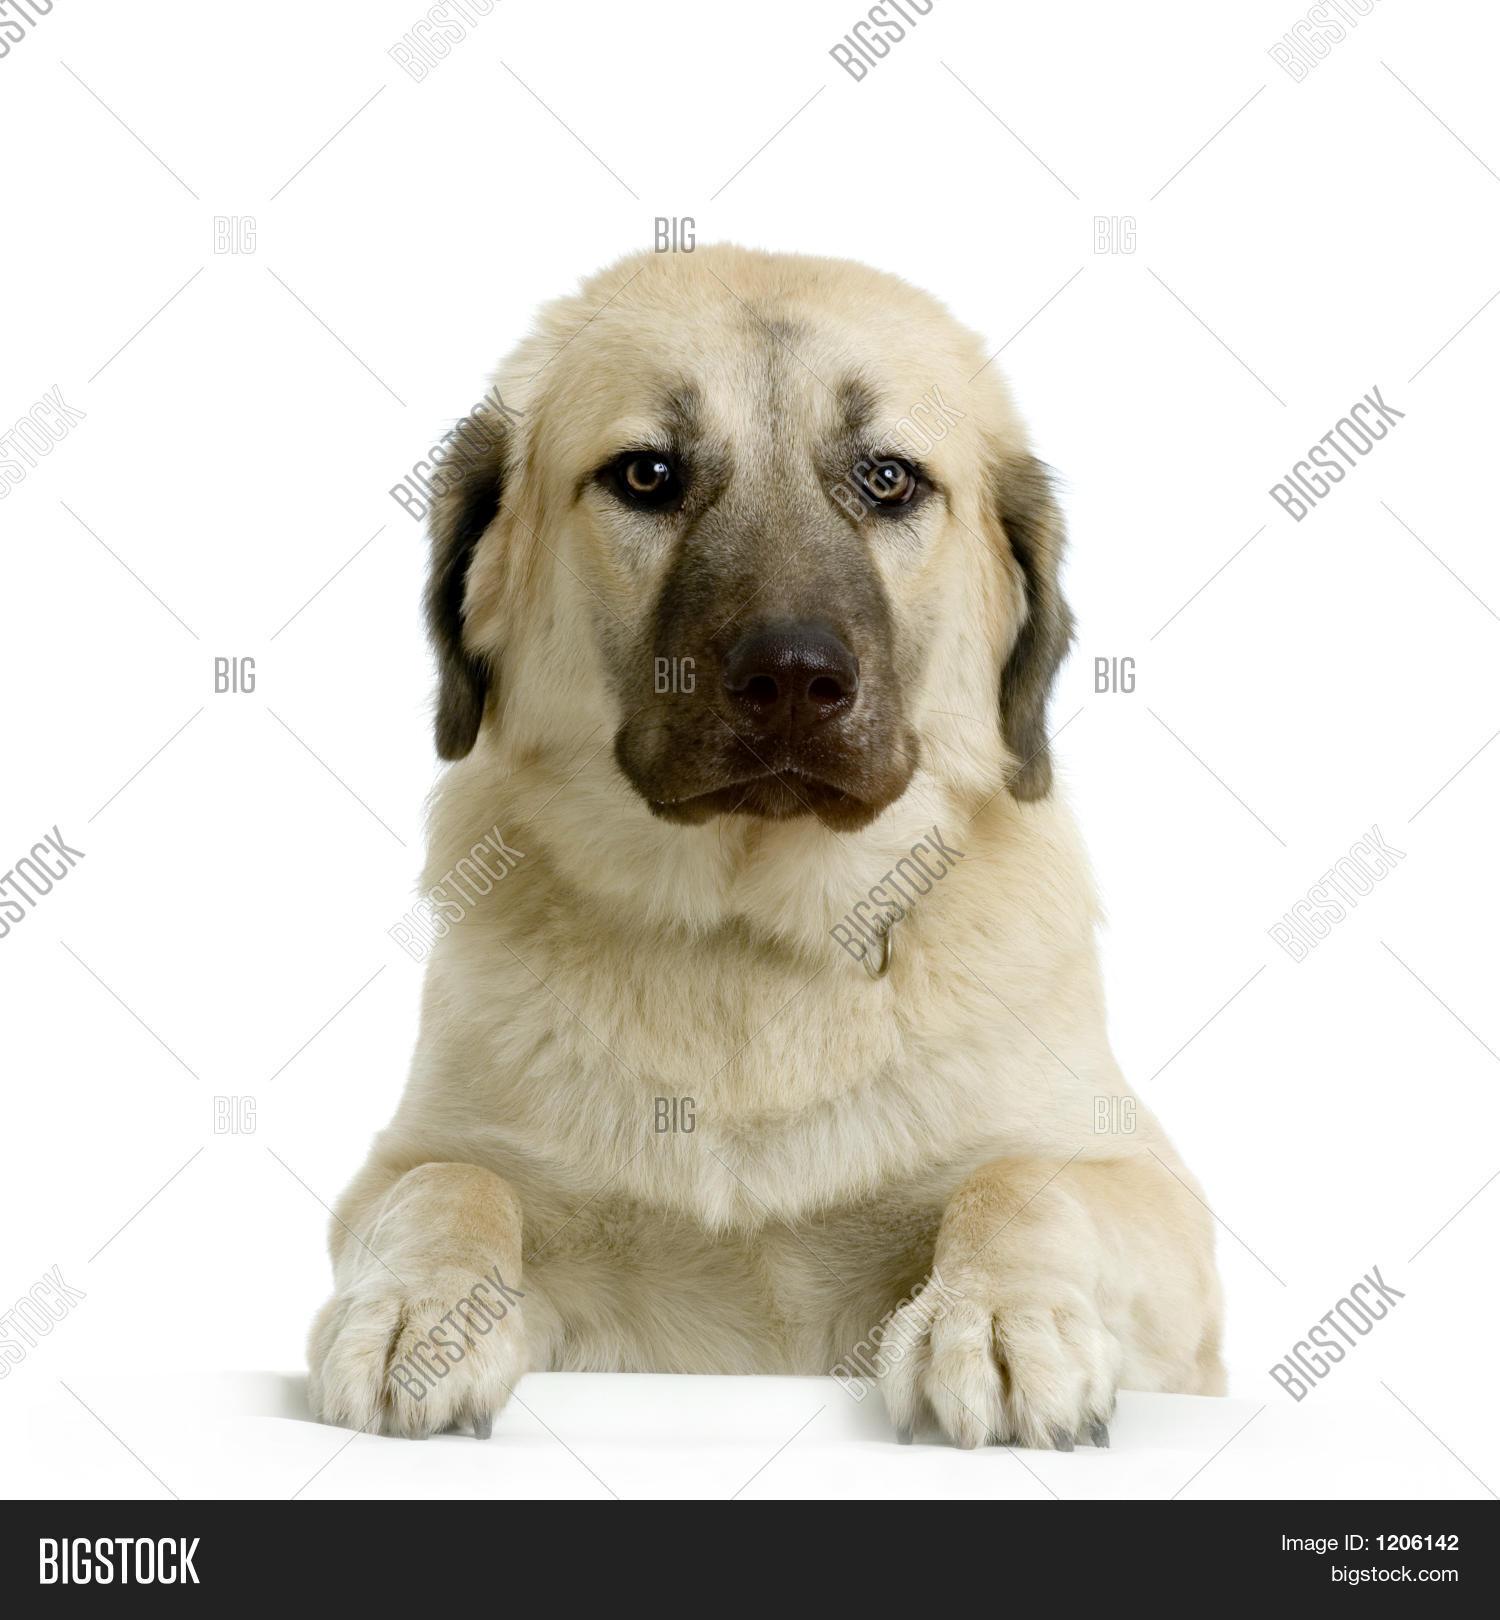 Anatolian Shepherd Dog Image & Photo (Free Trial)   Bigstock